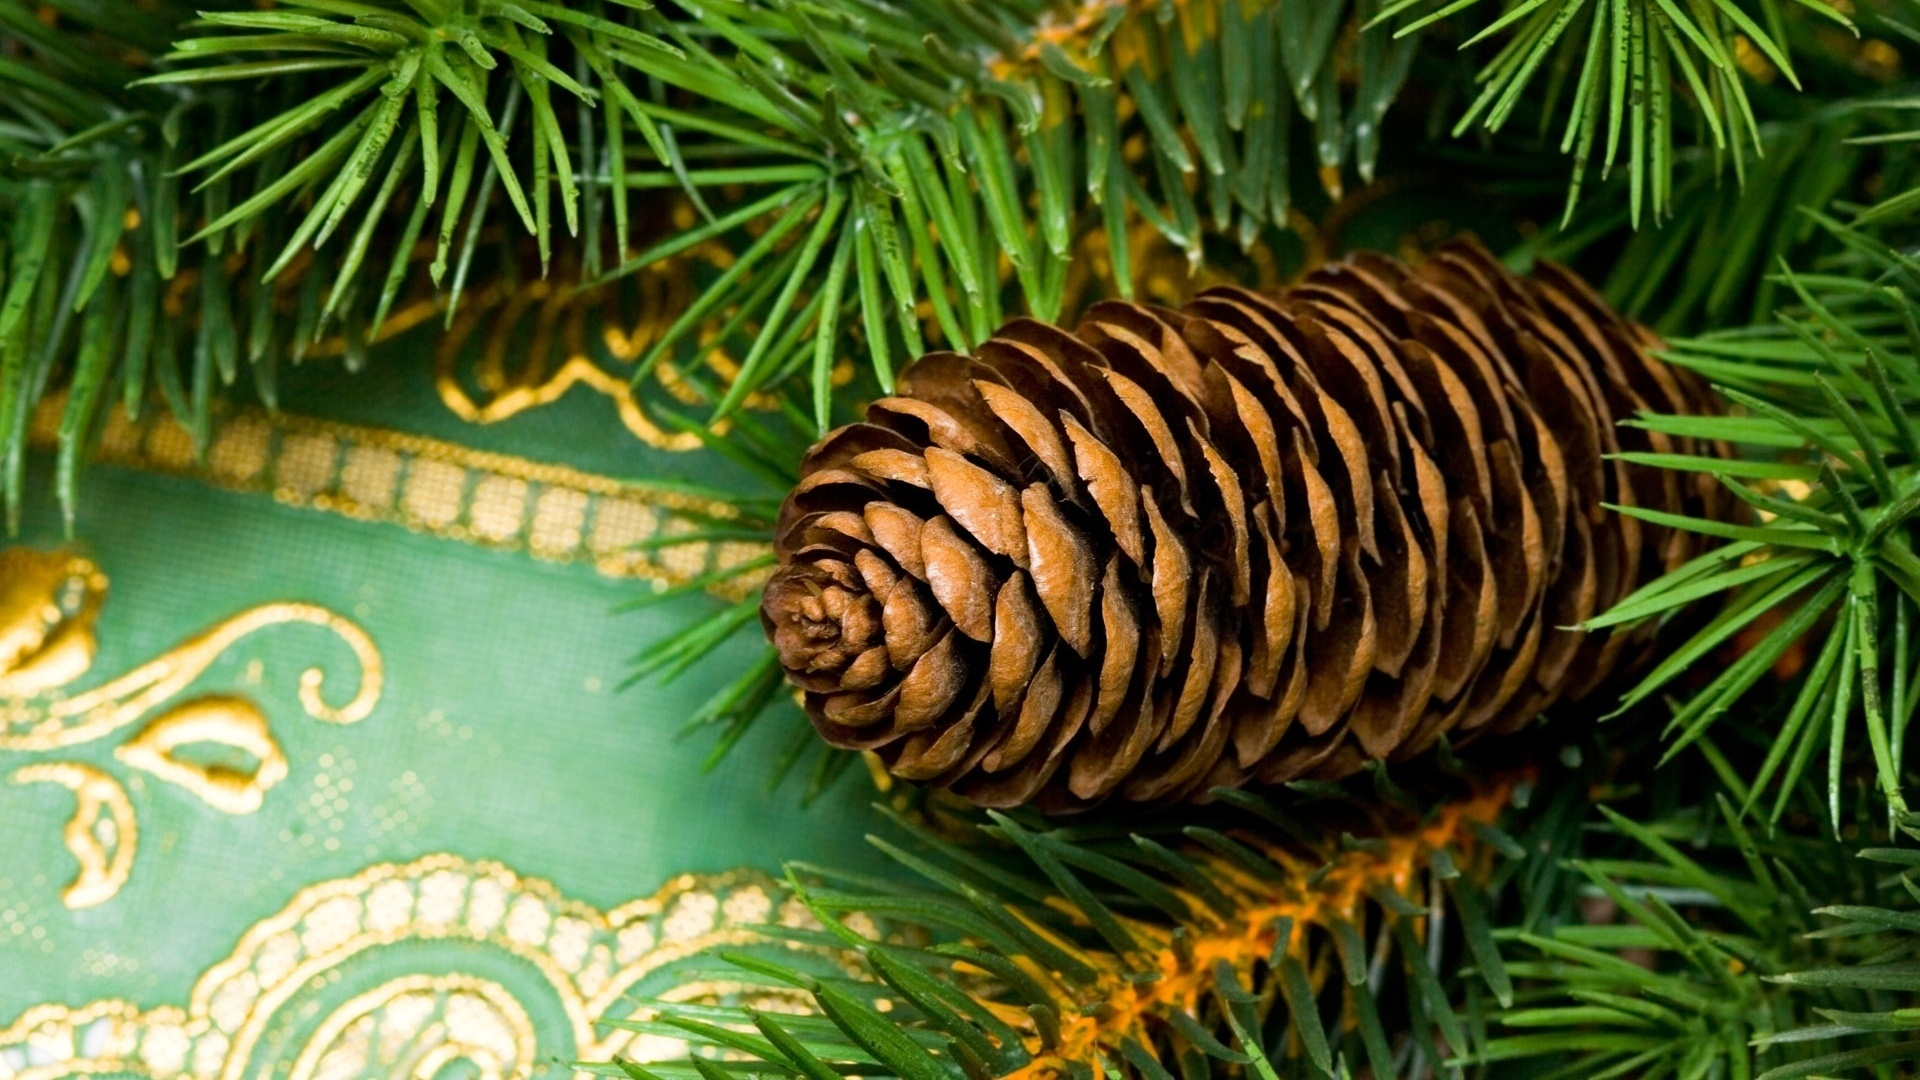 Pine Cone Background